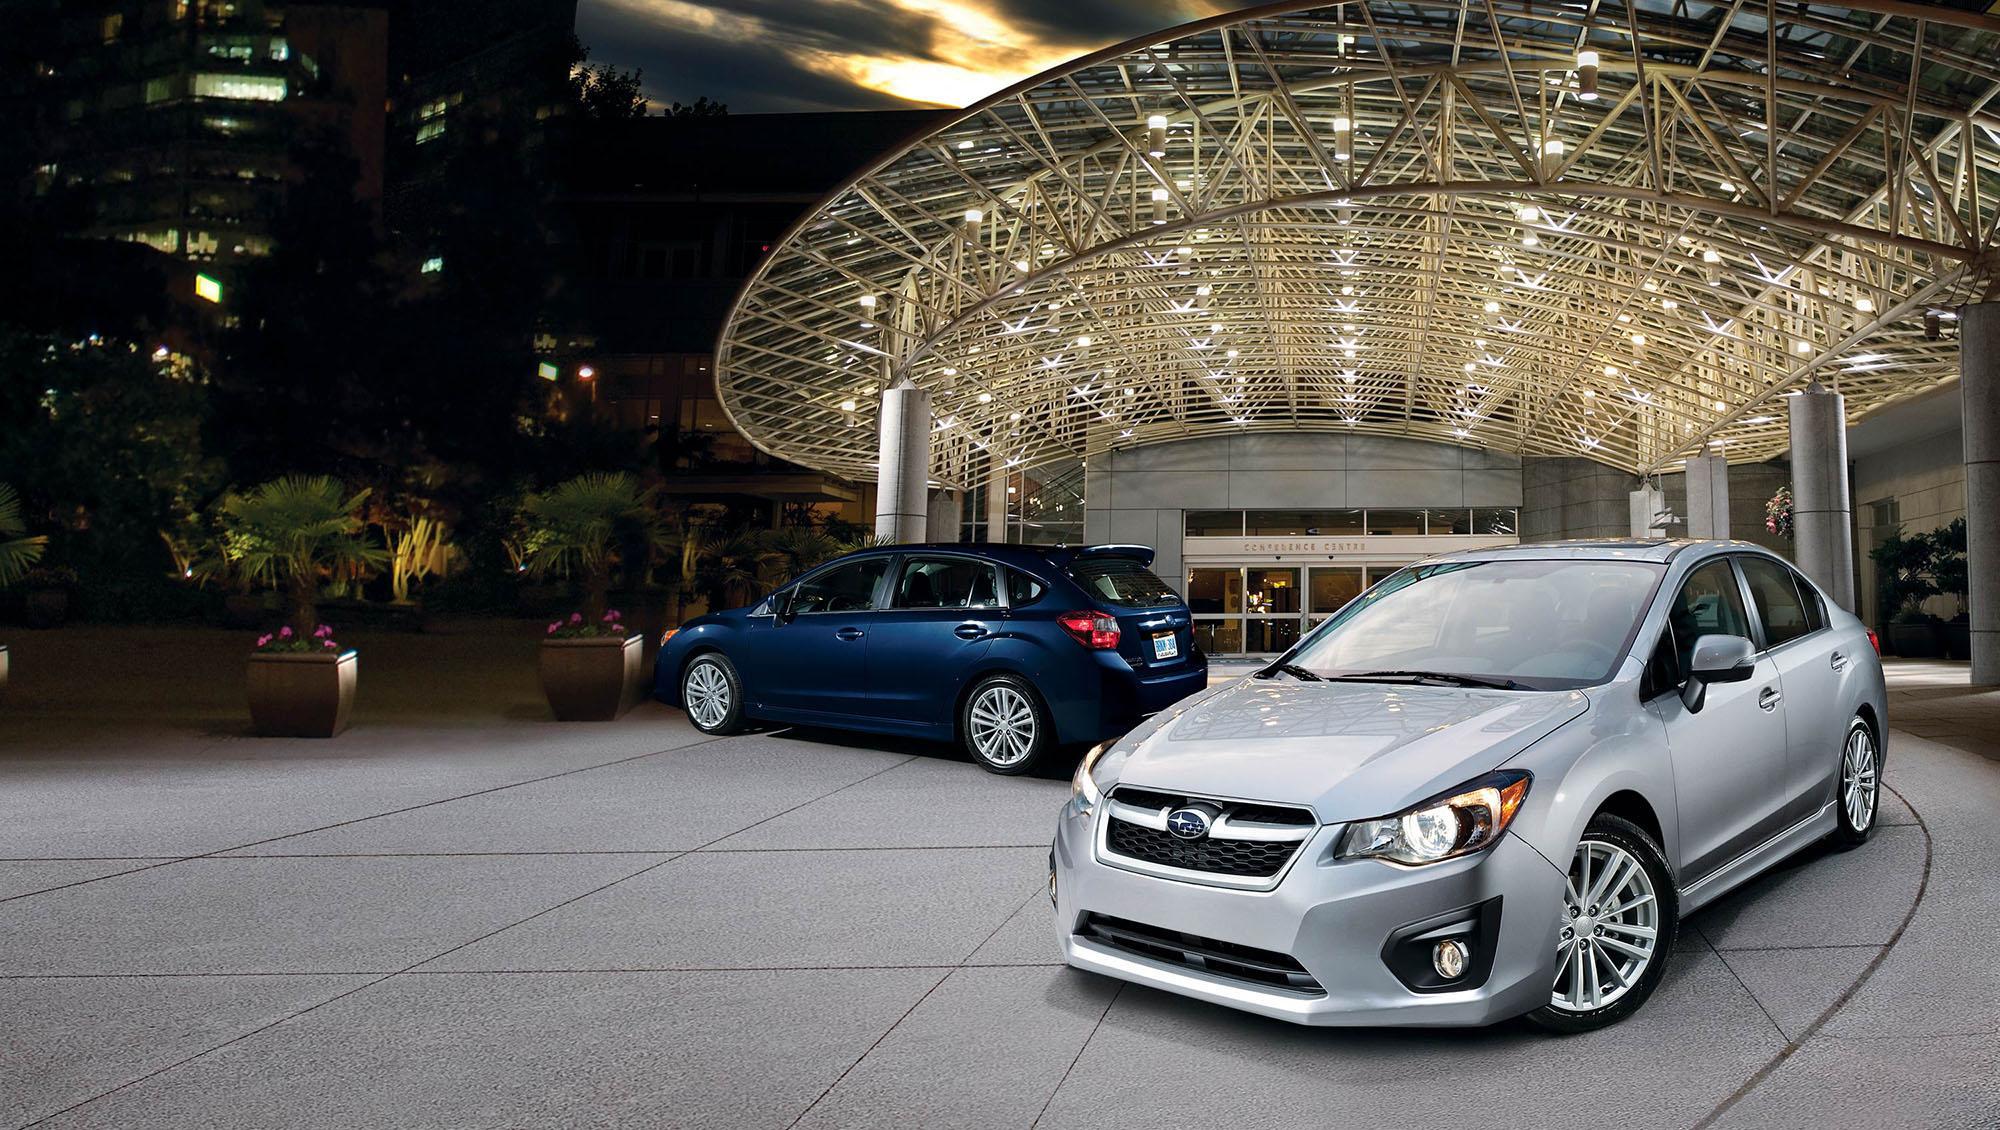 2014 Subaru Impreza Image 14